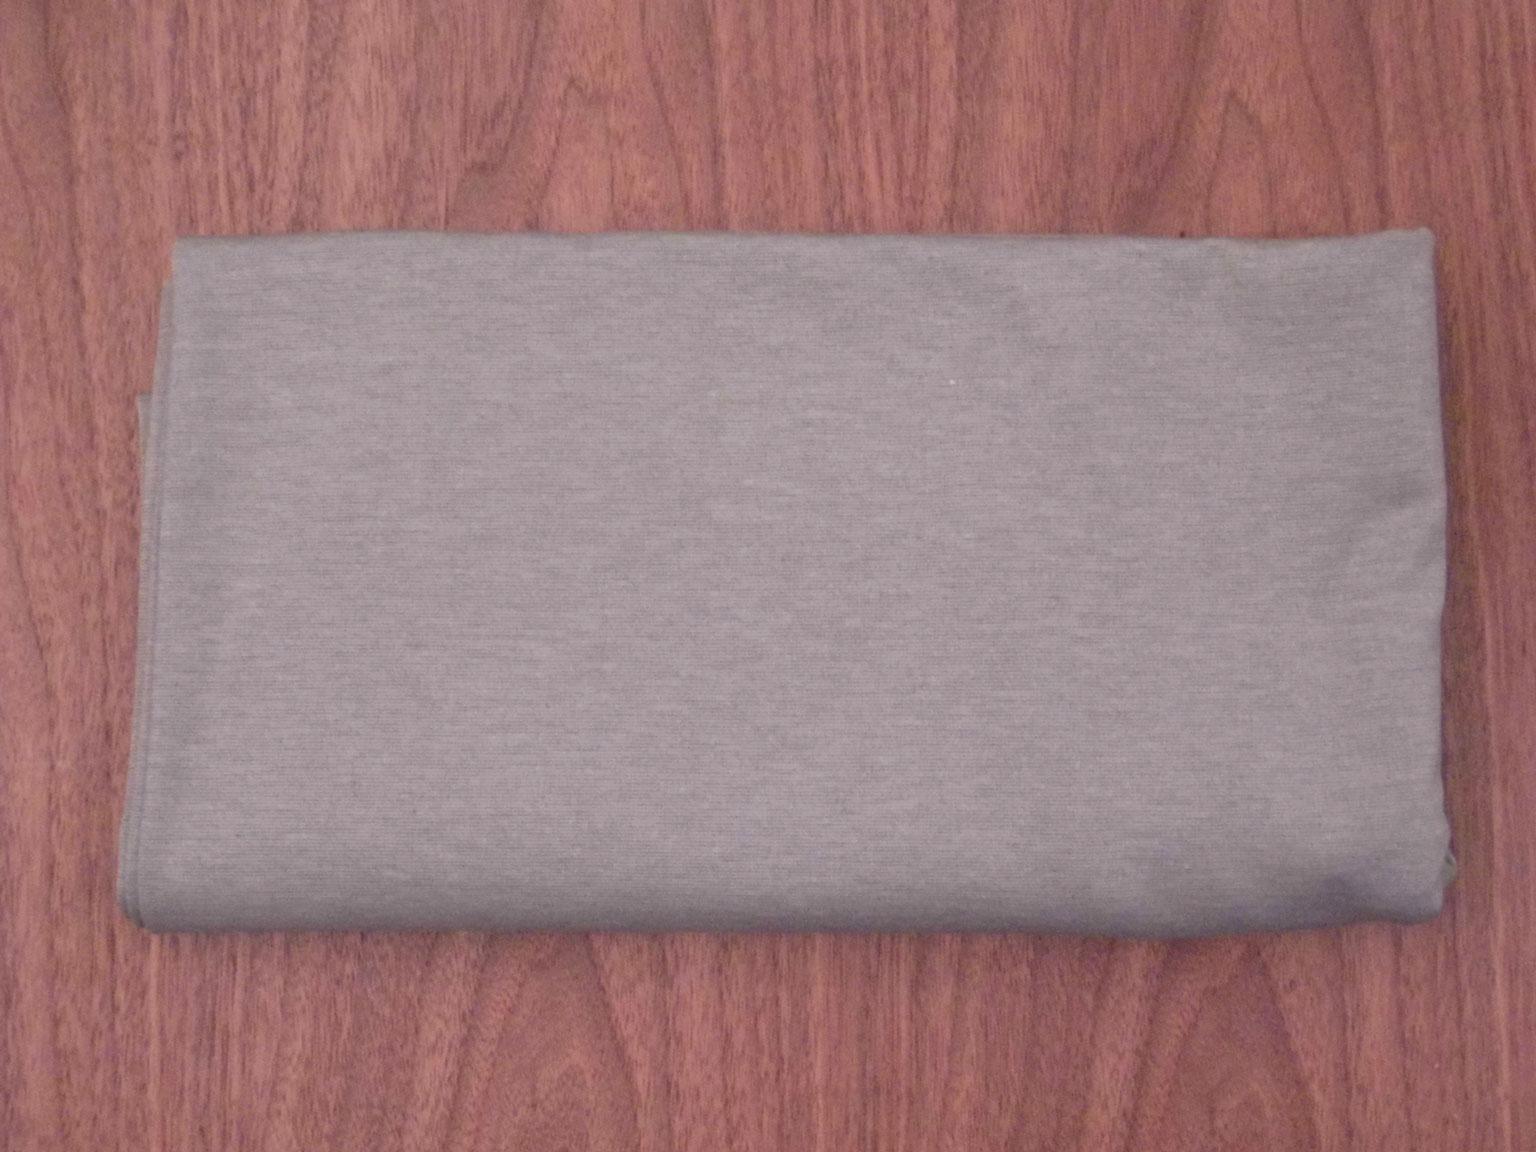 toaster-sweater-fabric